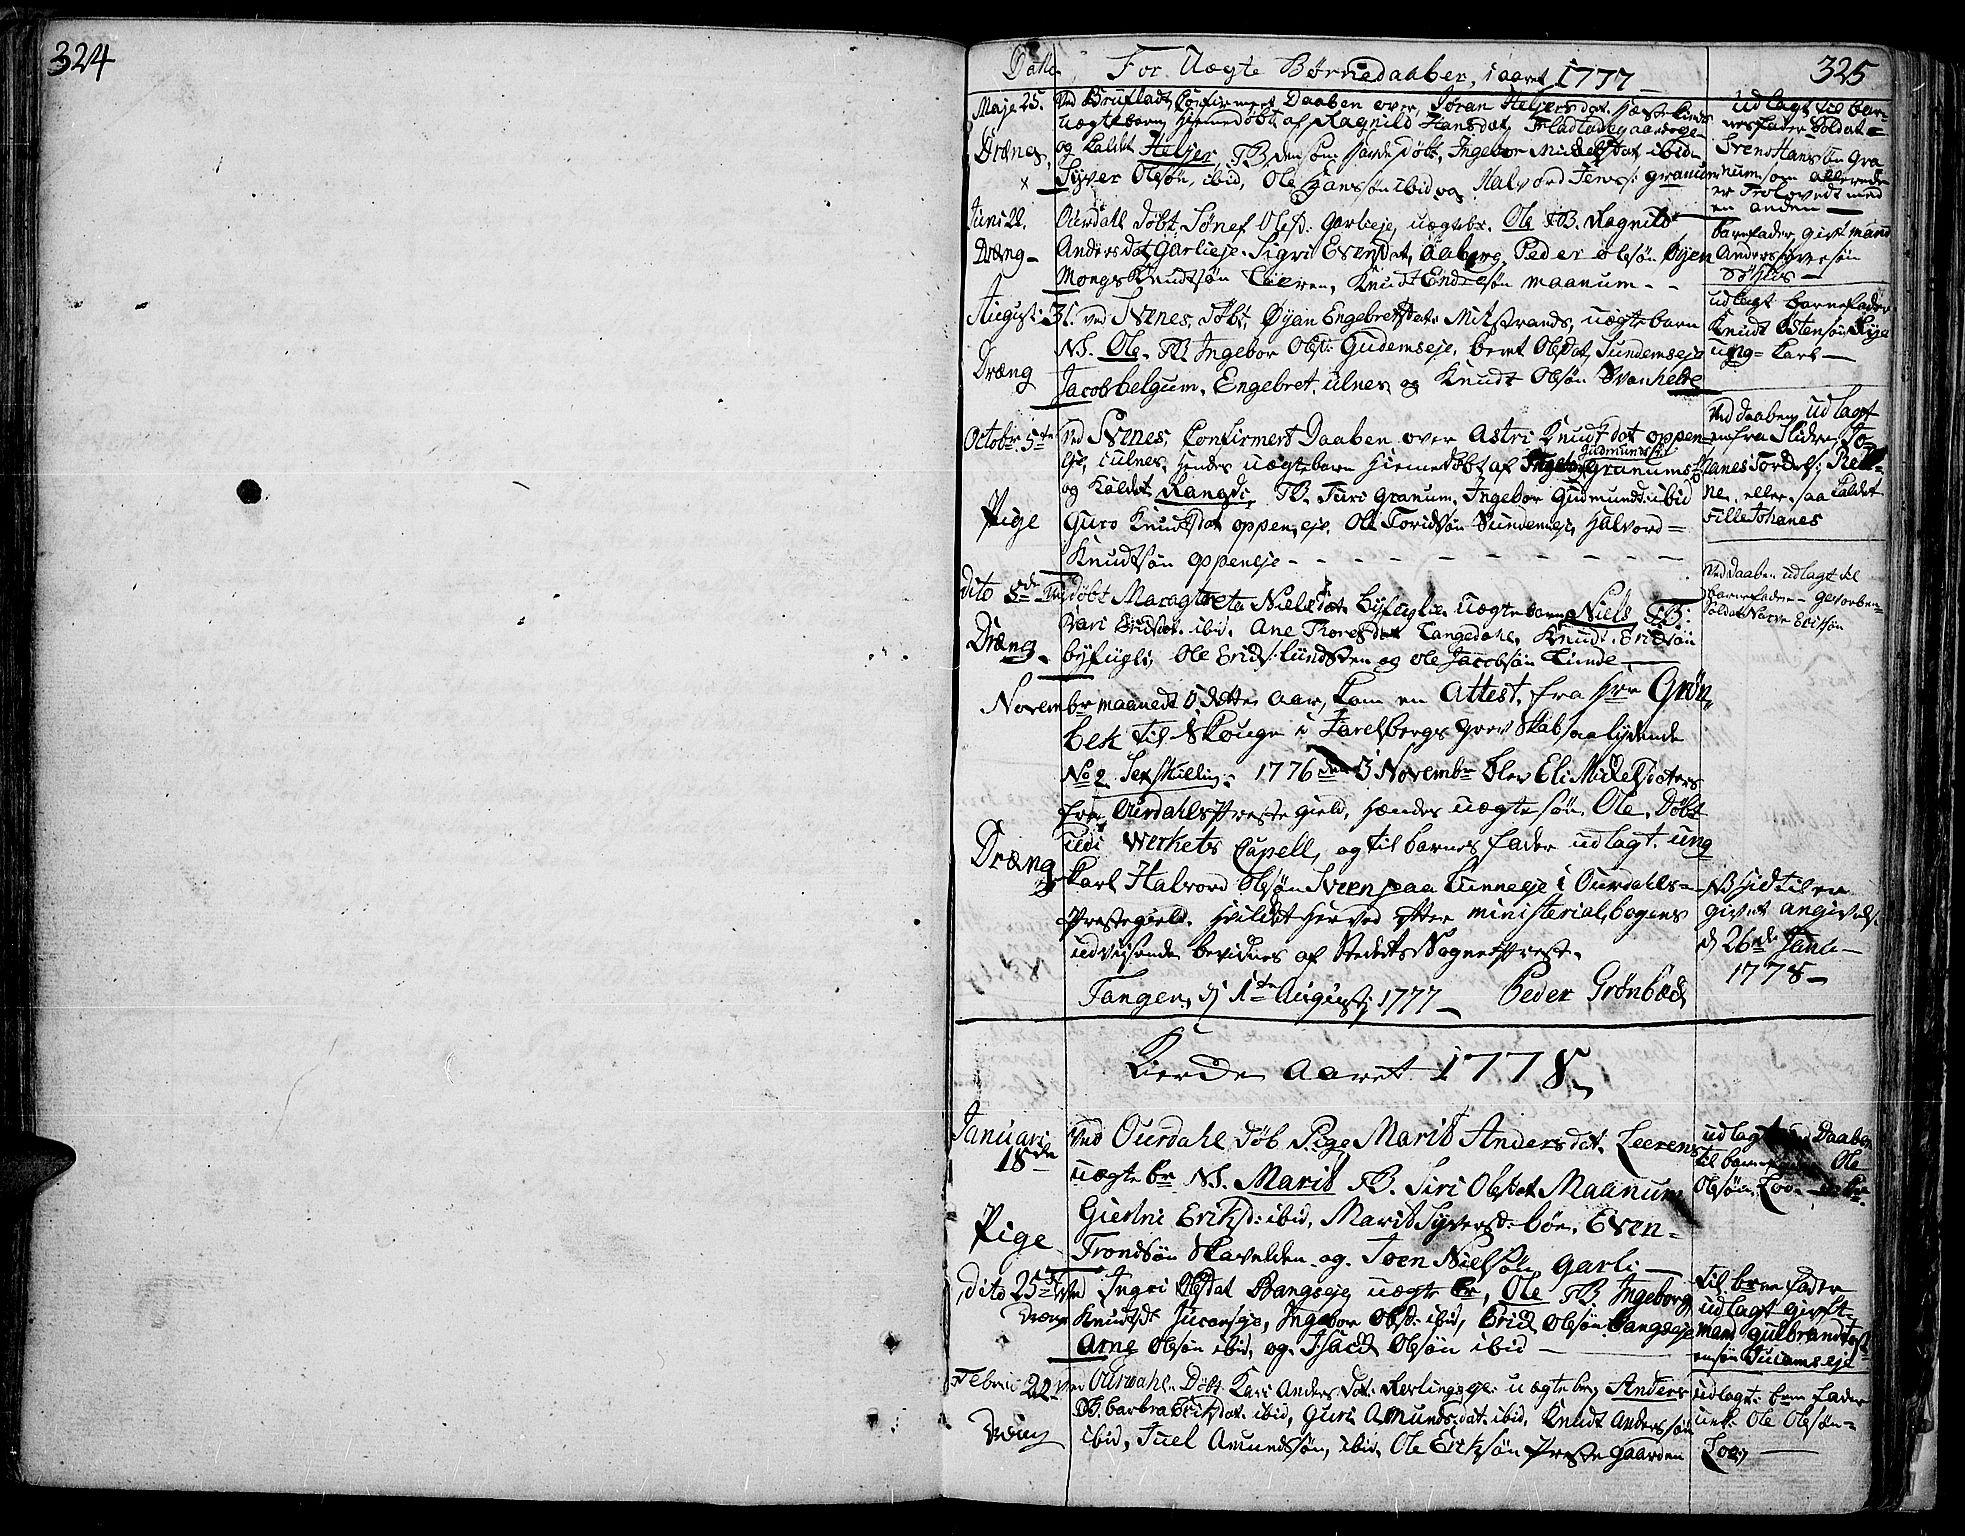 SAH, Aurdal prestekontor, Ministerialbok nr. 5, 1763-1781, s. 324-325